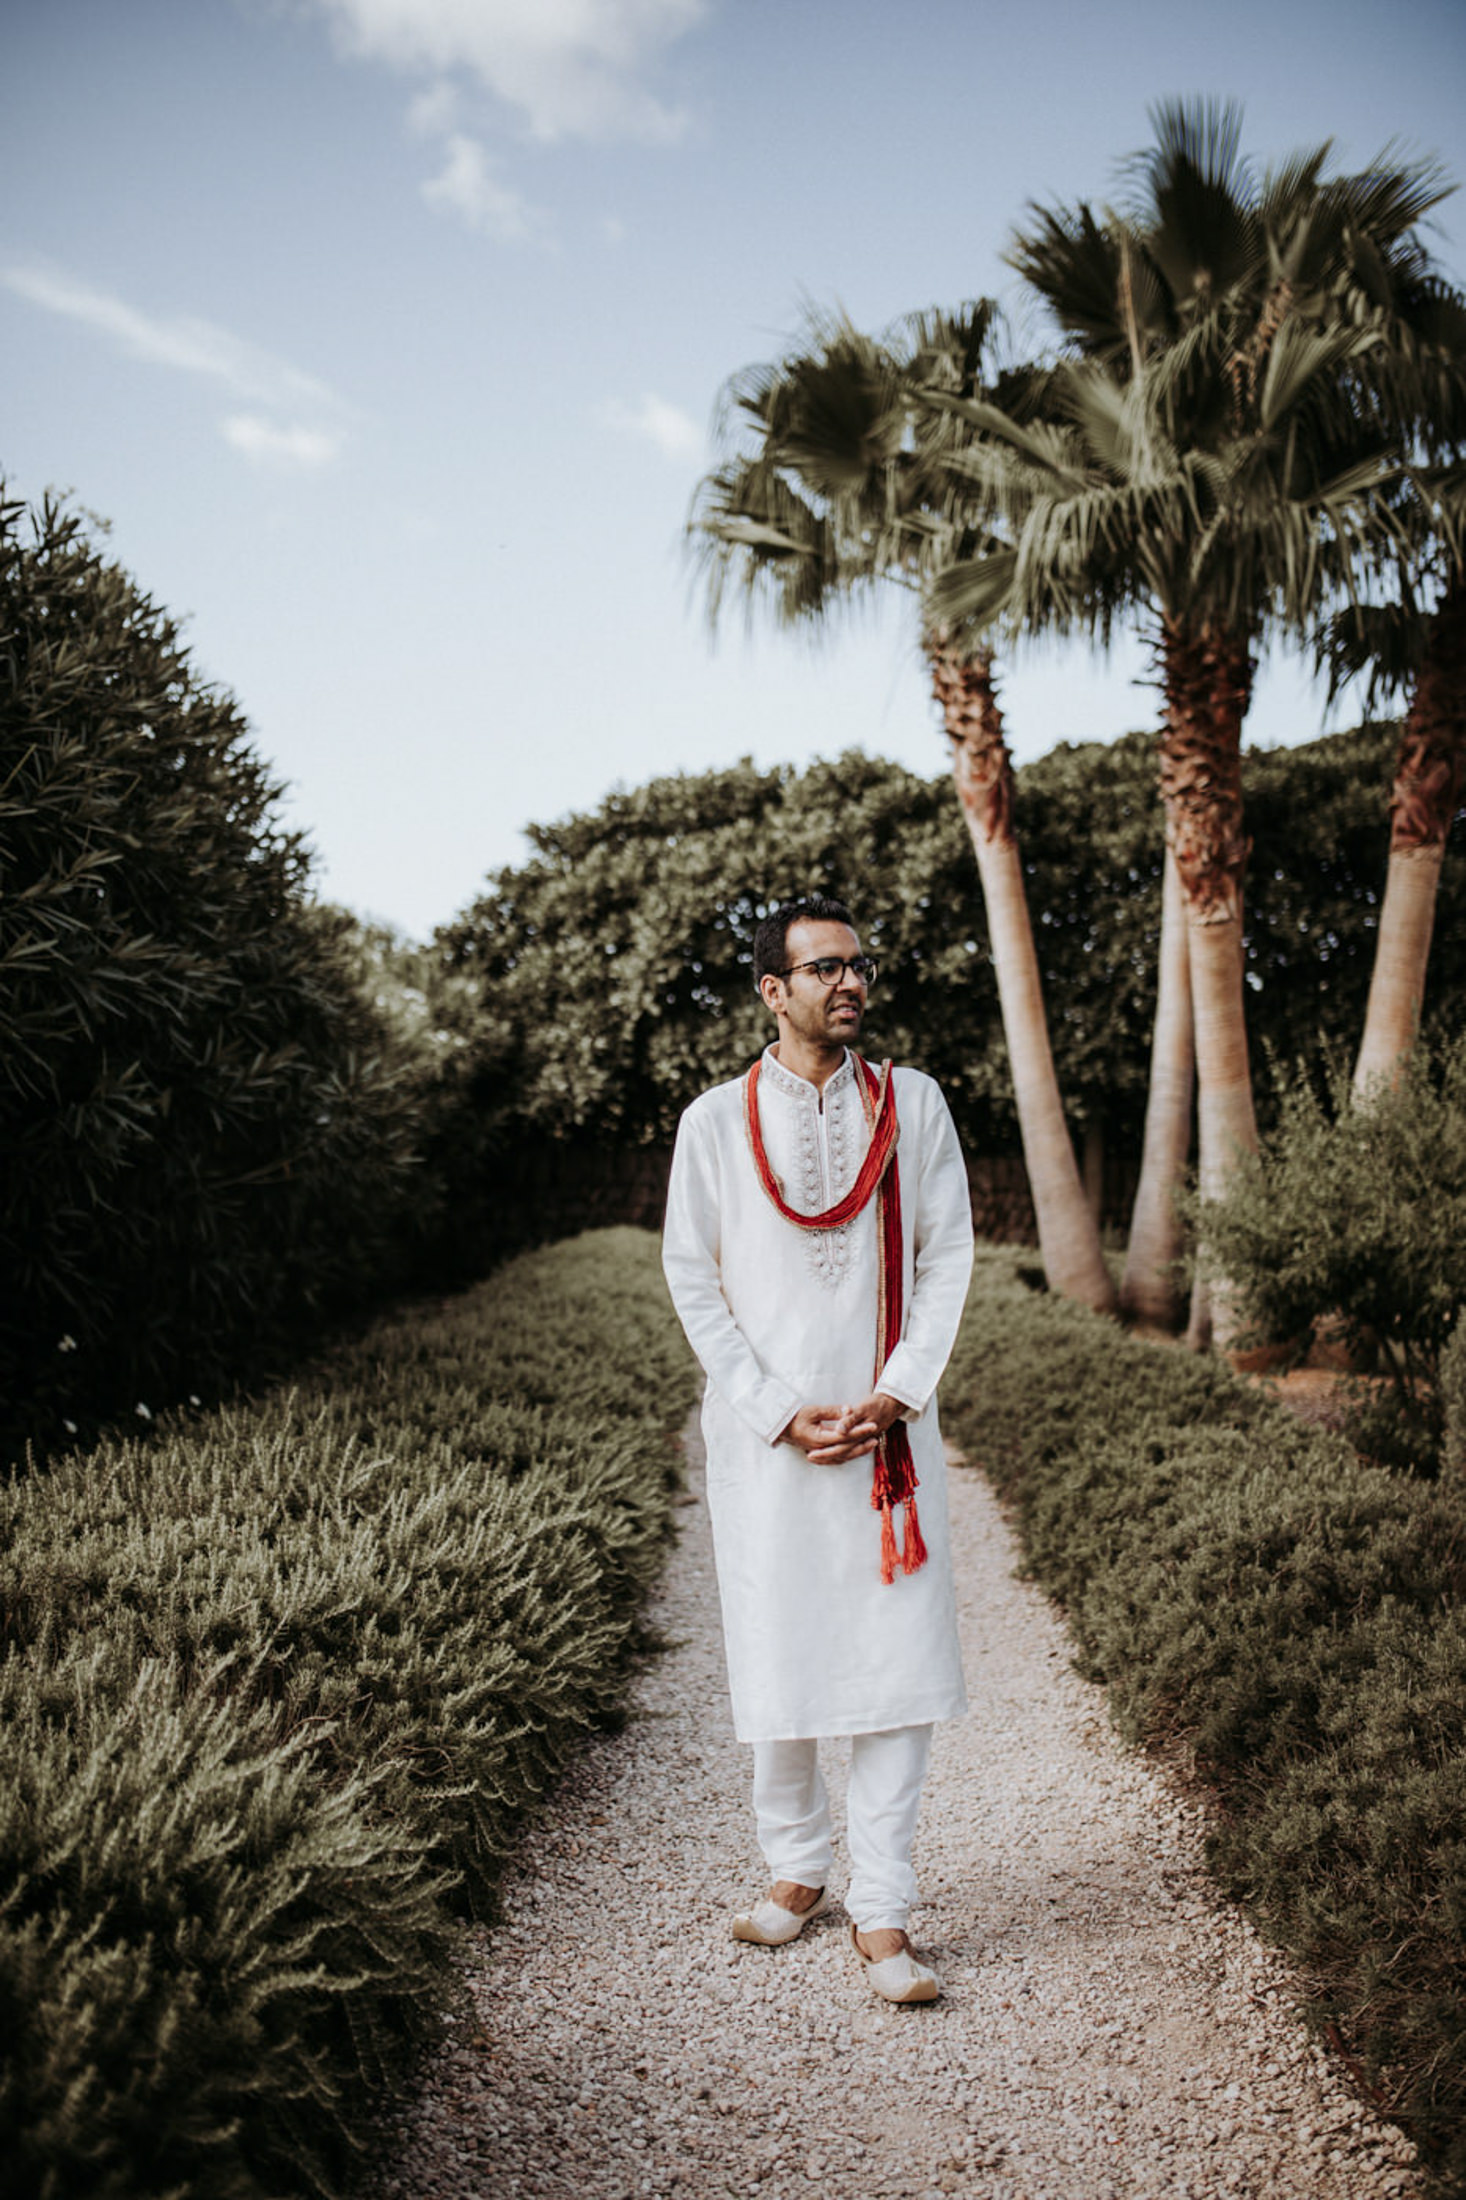 Wedding_Photographer_Mallorca_Daniela-Marquardt_Photography_New_York_Iceland_Tuscany_Santorini_Portugal_Austria_Bavaria_Elopement_Hochzeitsfotograf_AntjeRajat2_63